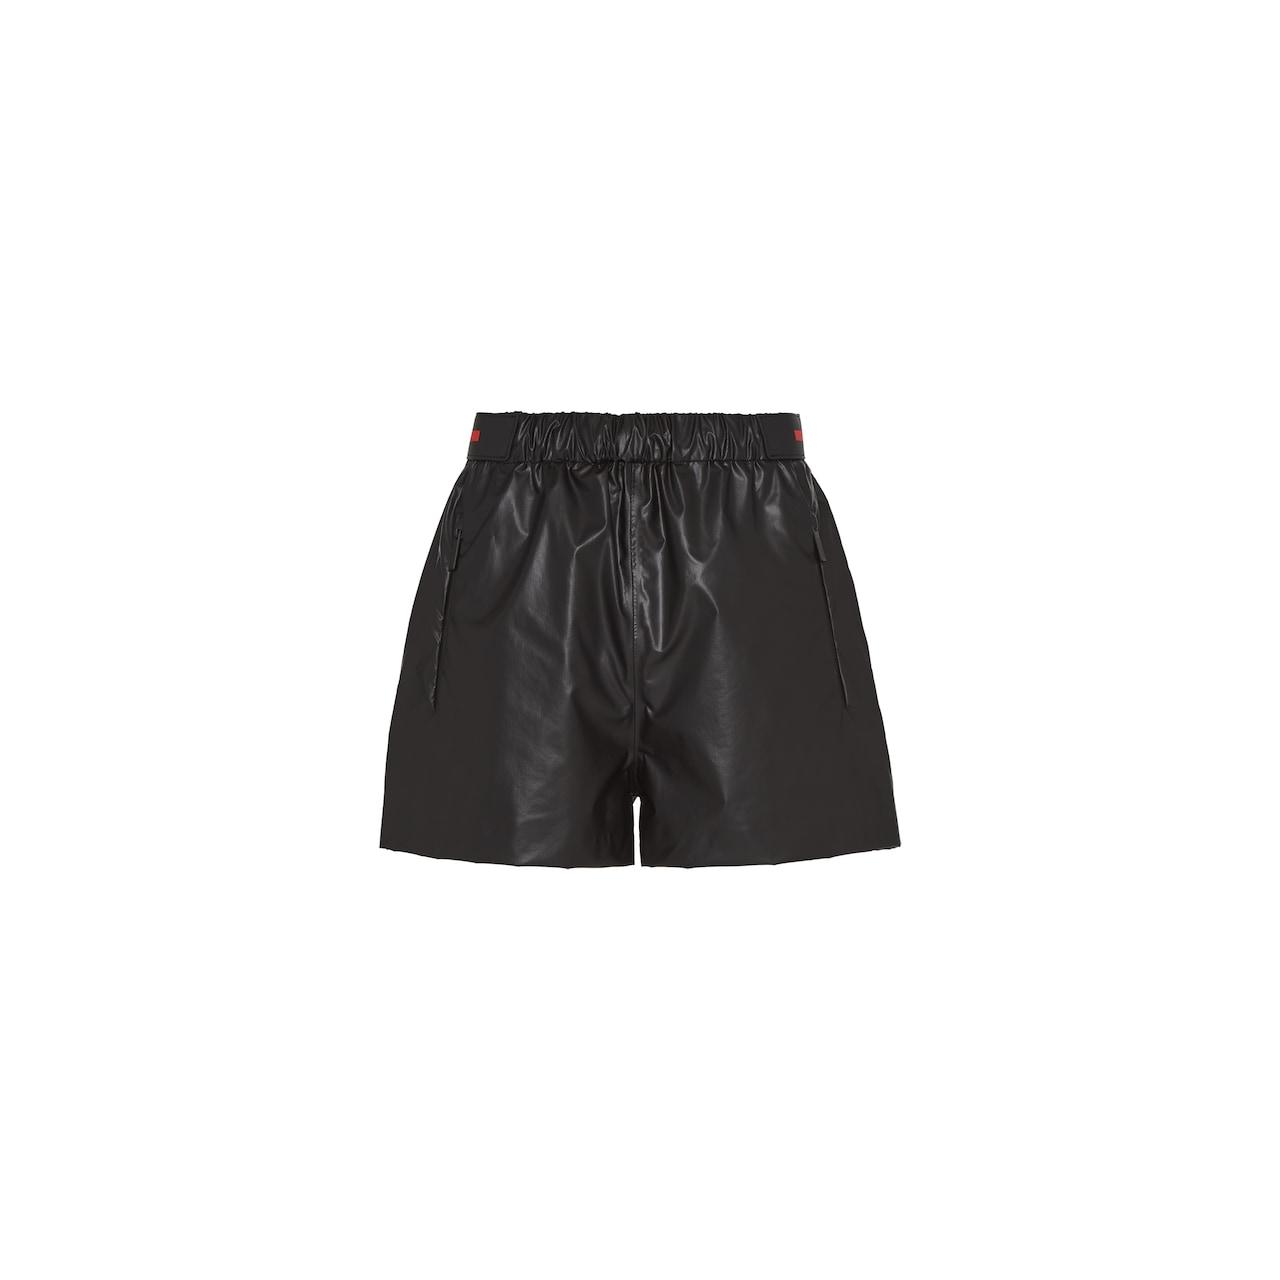 Prada LR-LX16-MK2 Light bonded nylon  shorts 1